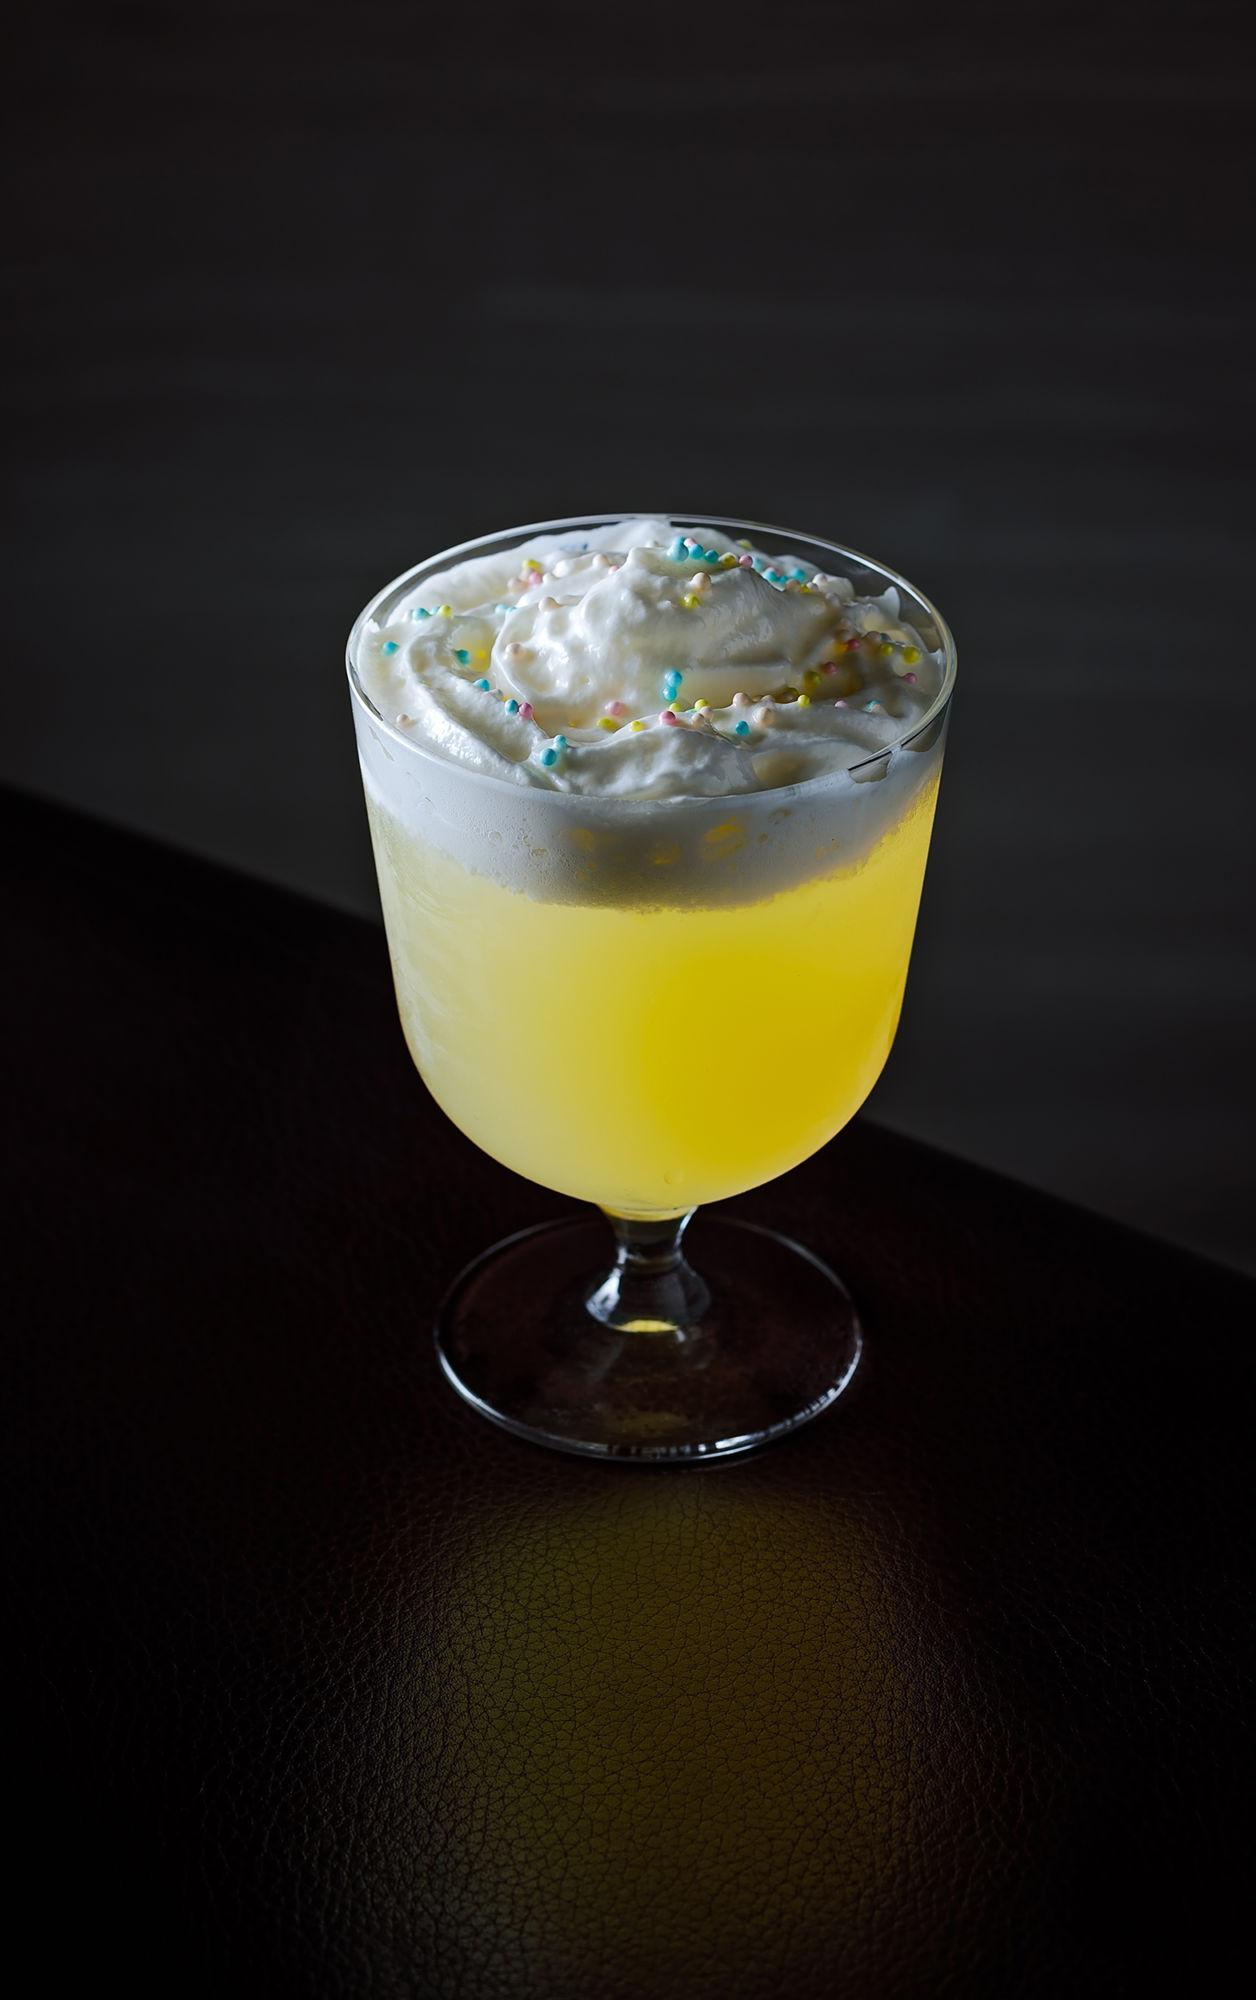 Pundusina vida rica bar art in mixology volume 2 movies cocktails mandarin oriental macao